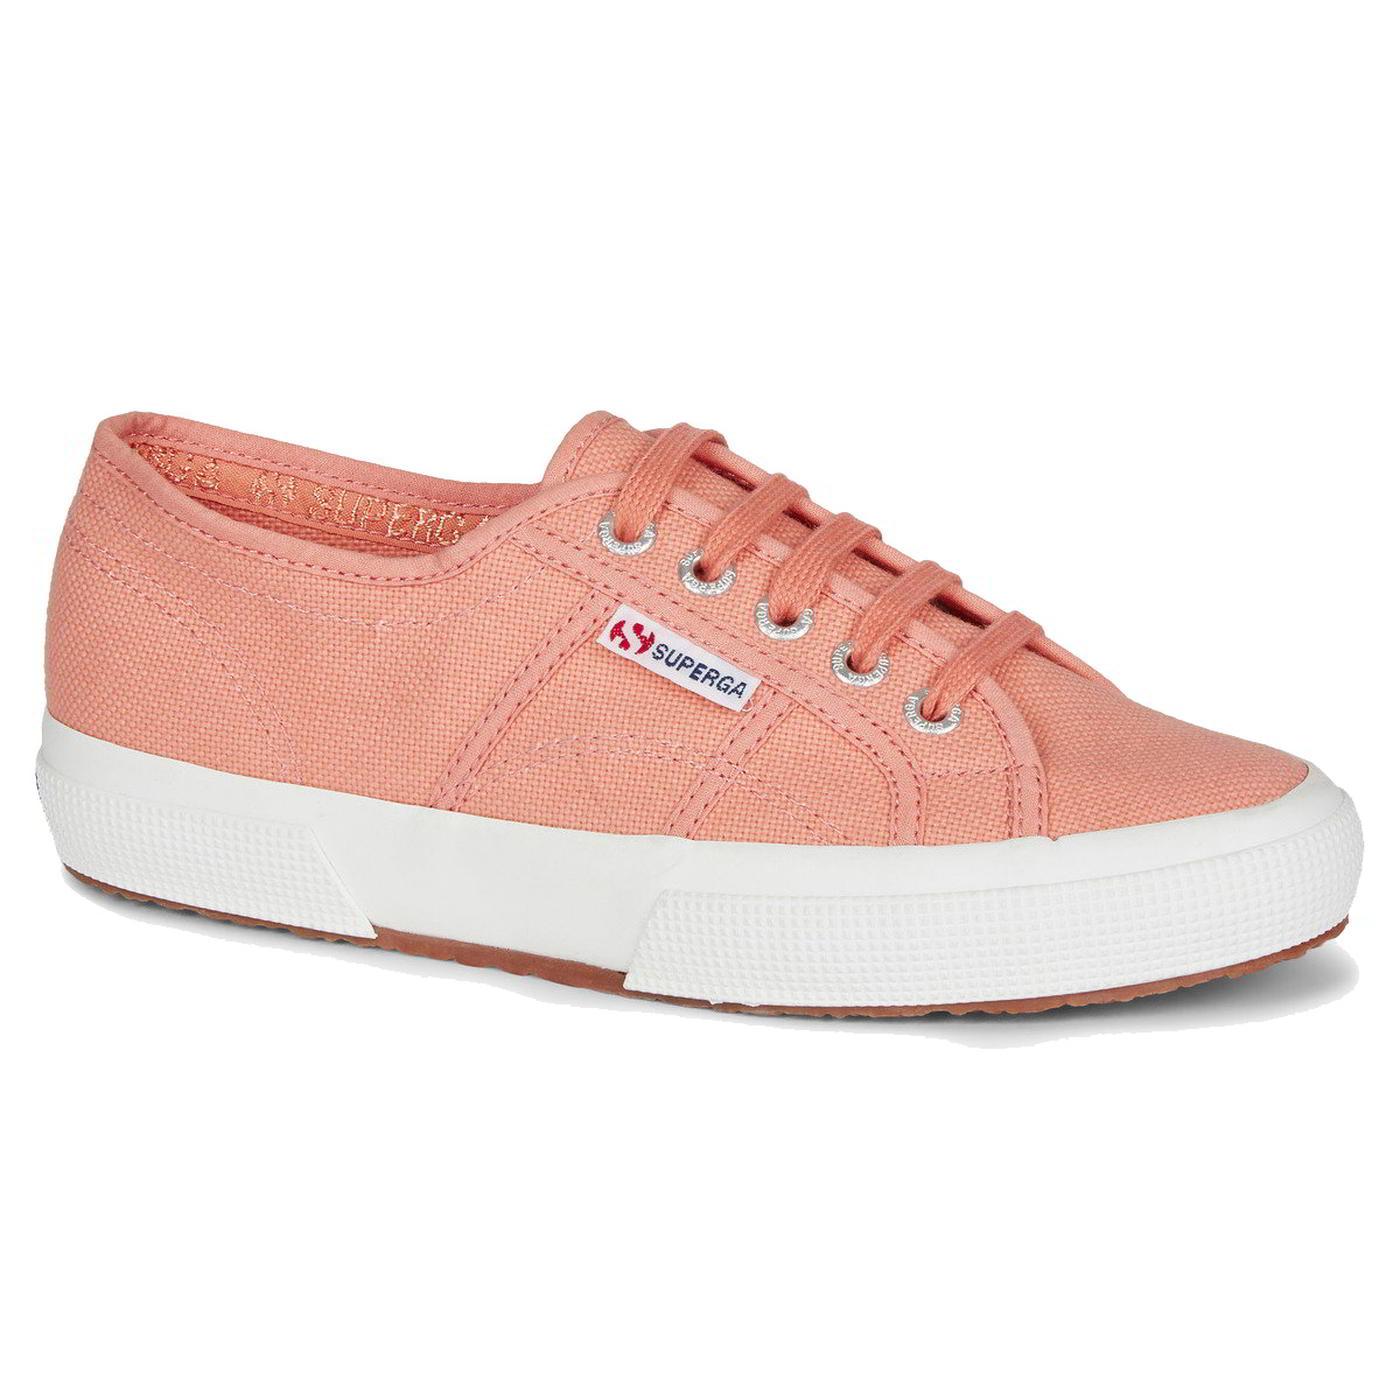 Superga 2750 Cotu Classic Womens Ladies Trainers Shoes Plimsolls Size 4-8